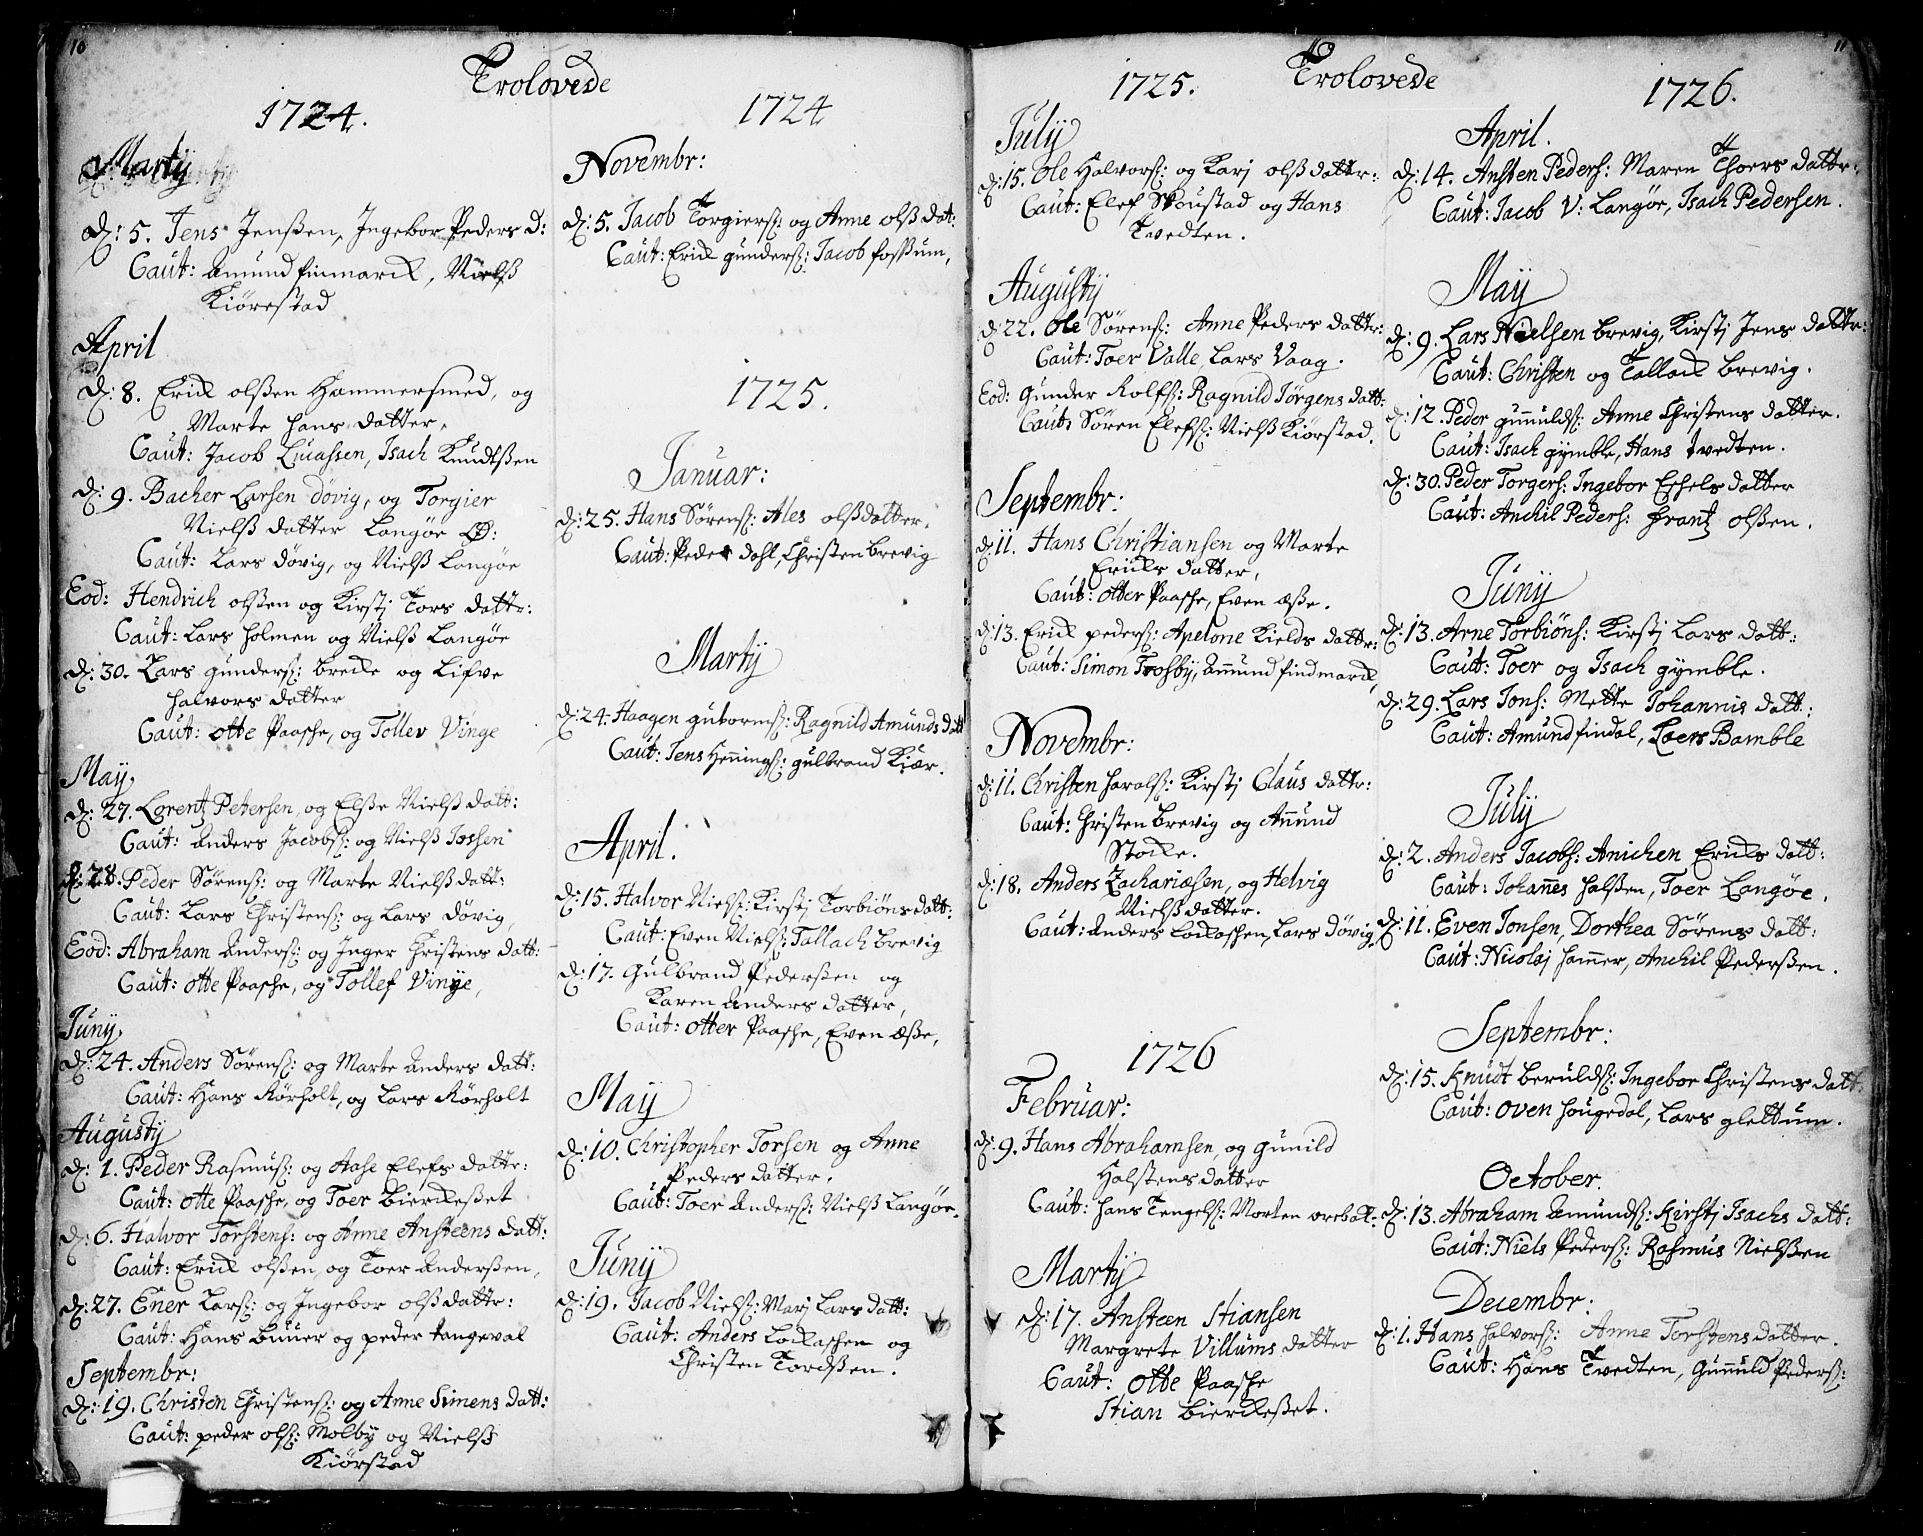 SAKO, Bamble kirkebøker, F/Fa/L0001: Ministerialbok nr. I 1, 1702-1774, s. 10-11